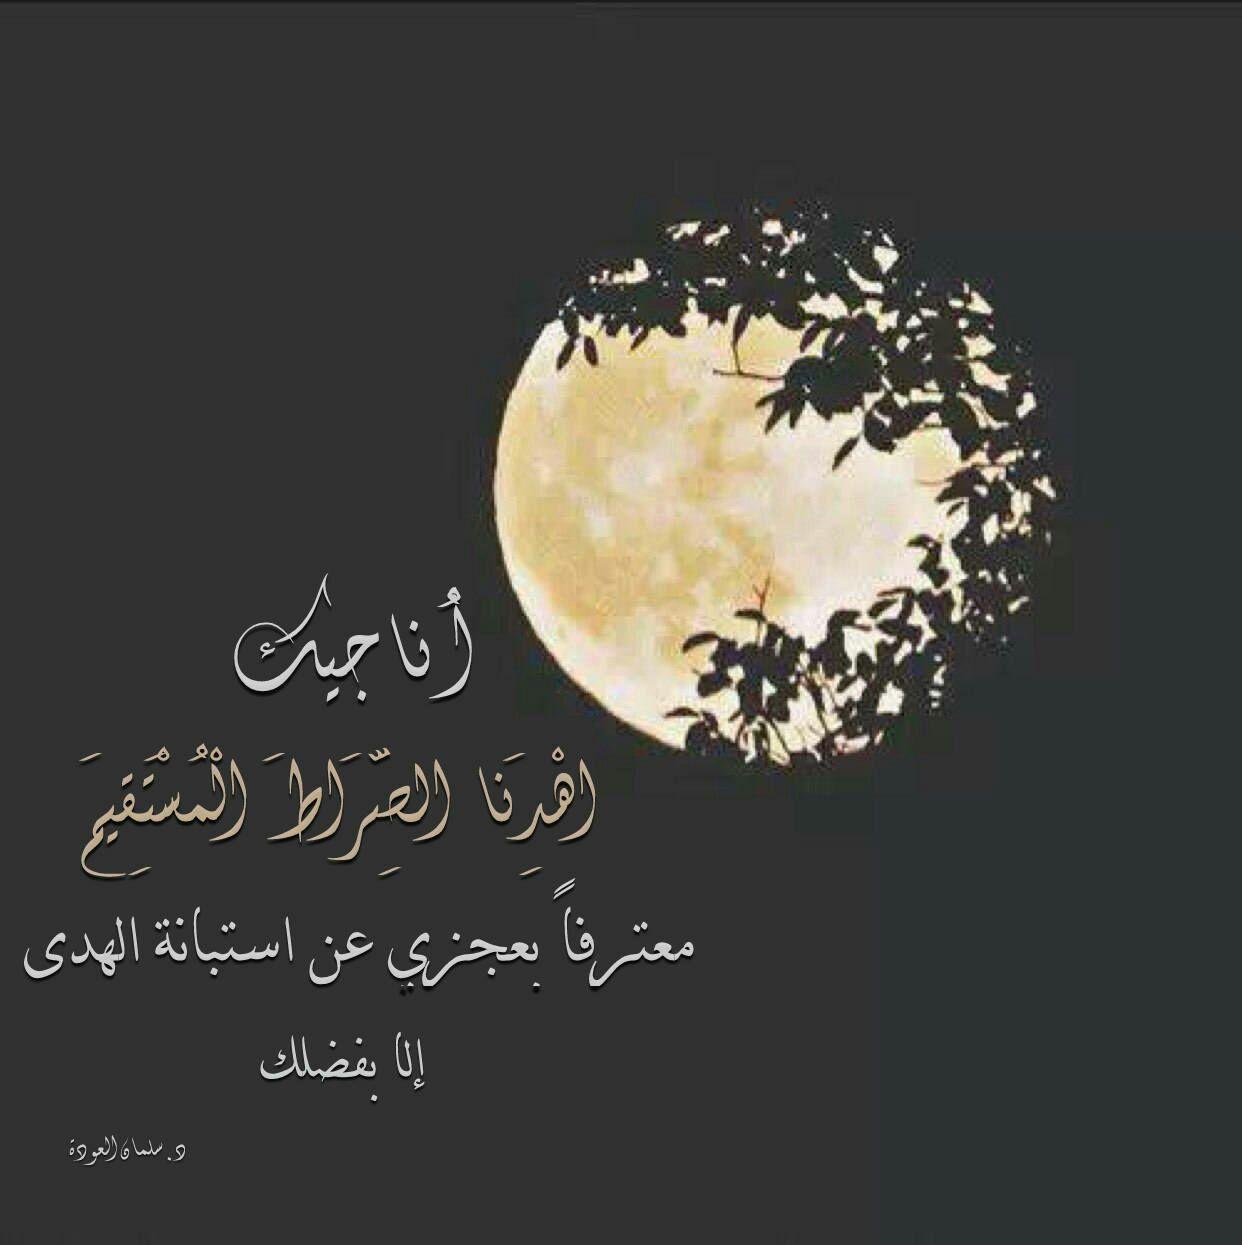 Pin By Ezzaz On دعاء Celestial Celestial Bodies Arabic Quotes